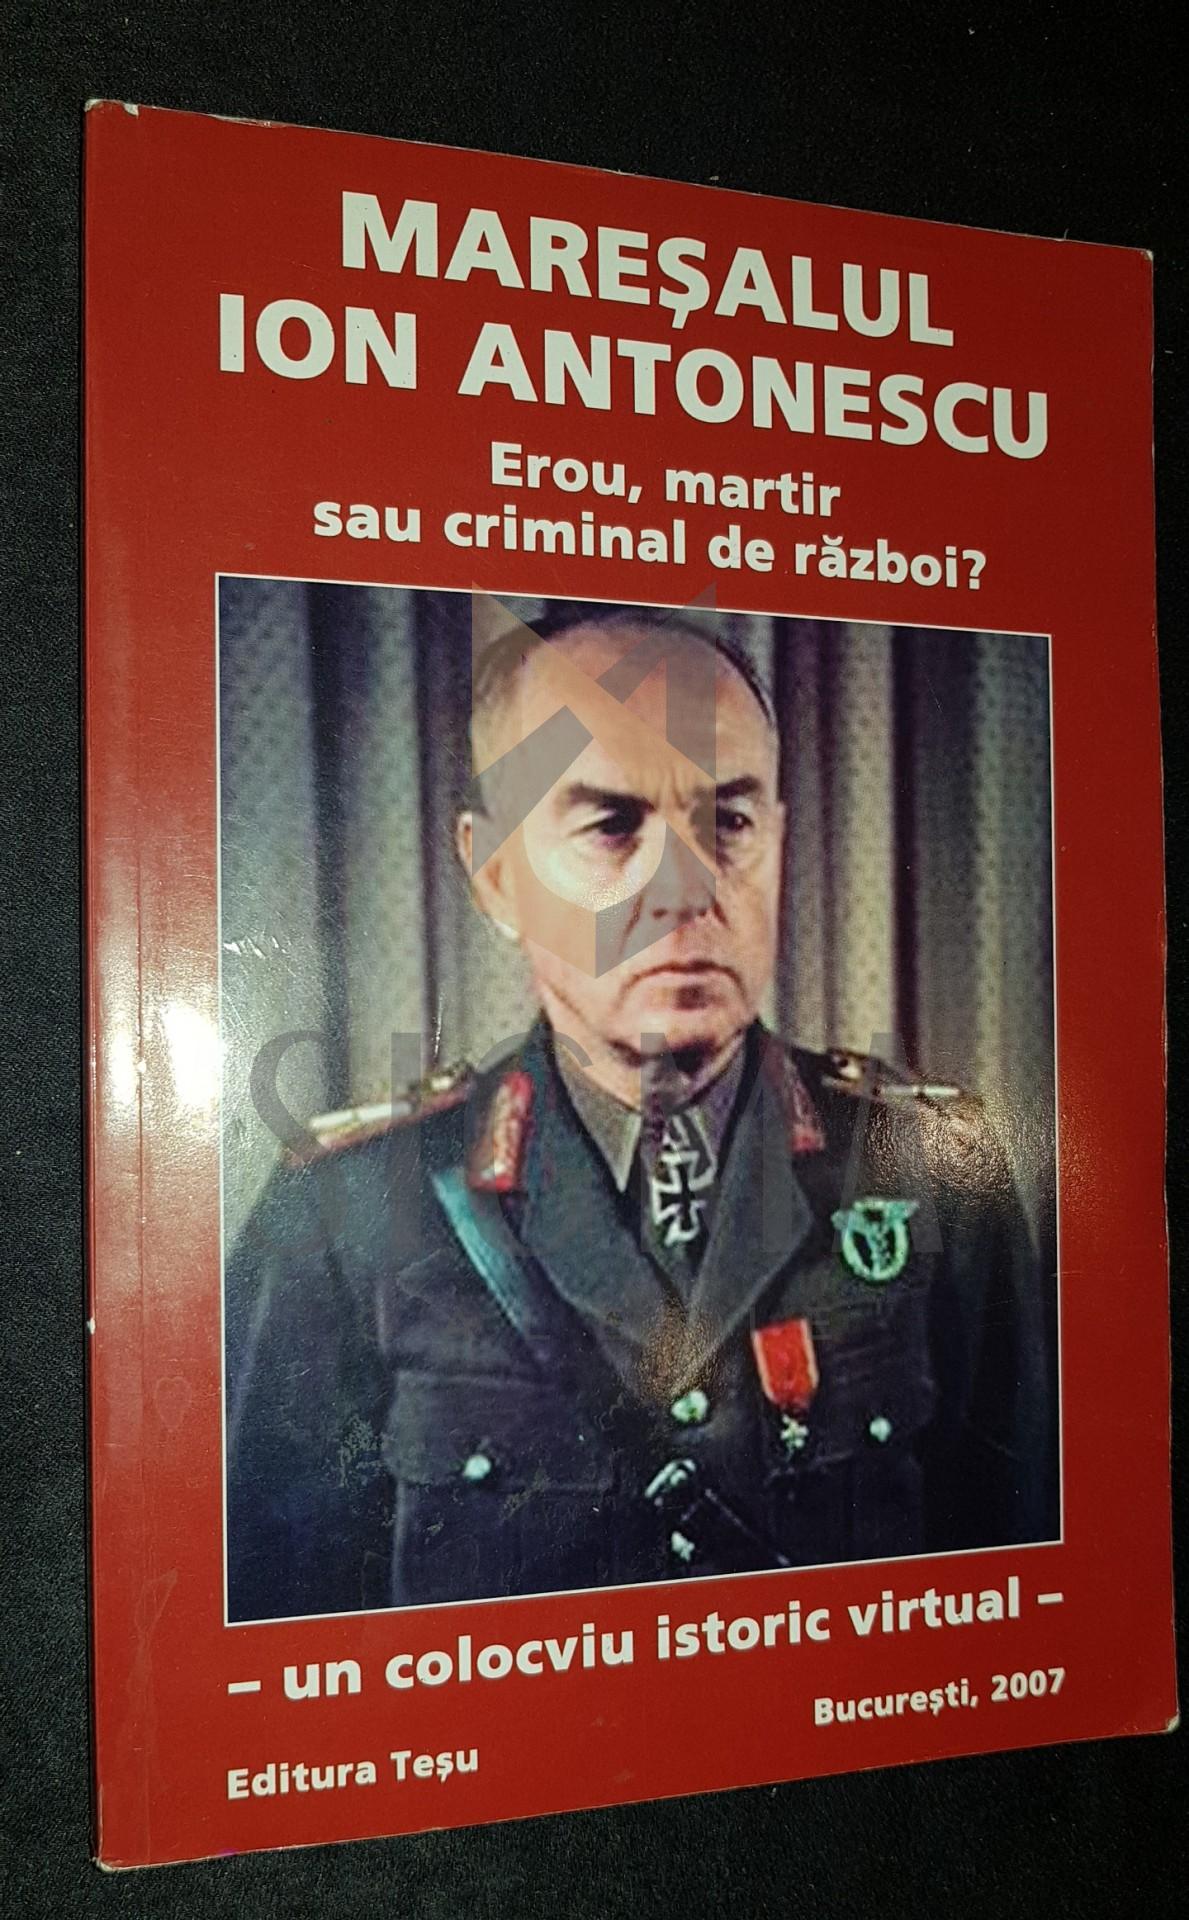 MIHULIN VIOLETA, SOLON MARTA si SOLOMOVICI TISU (Editor)